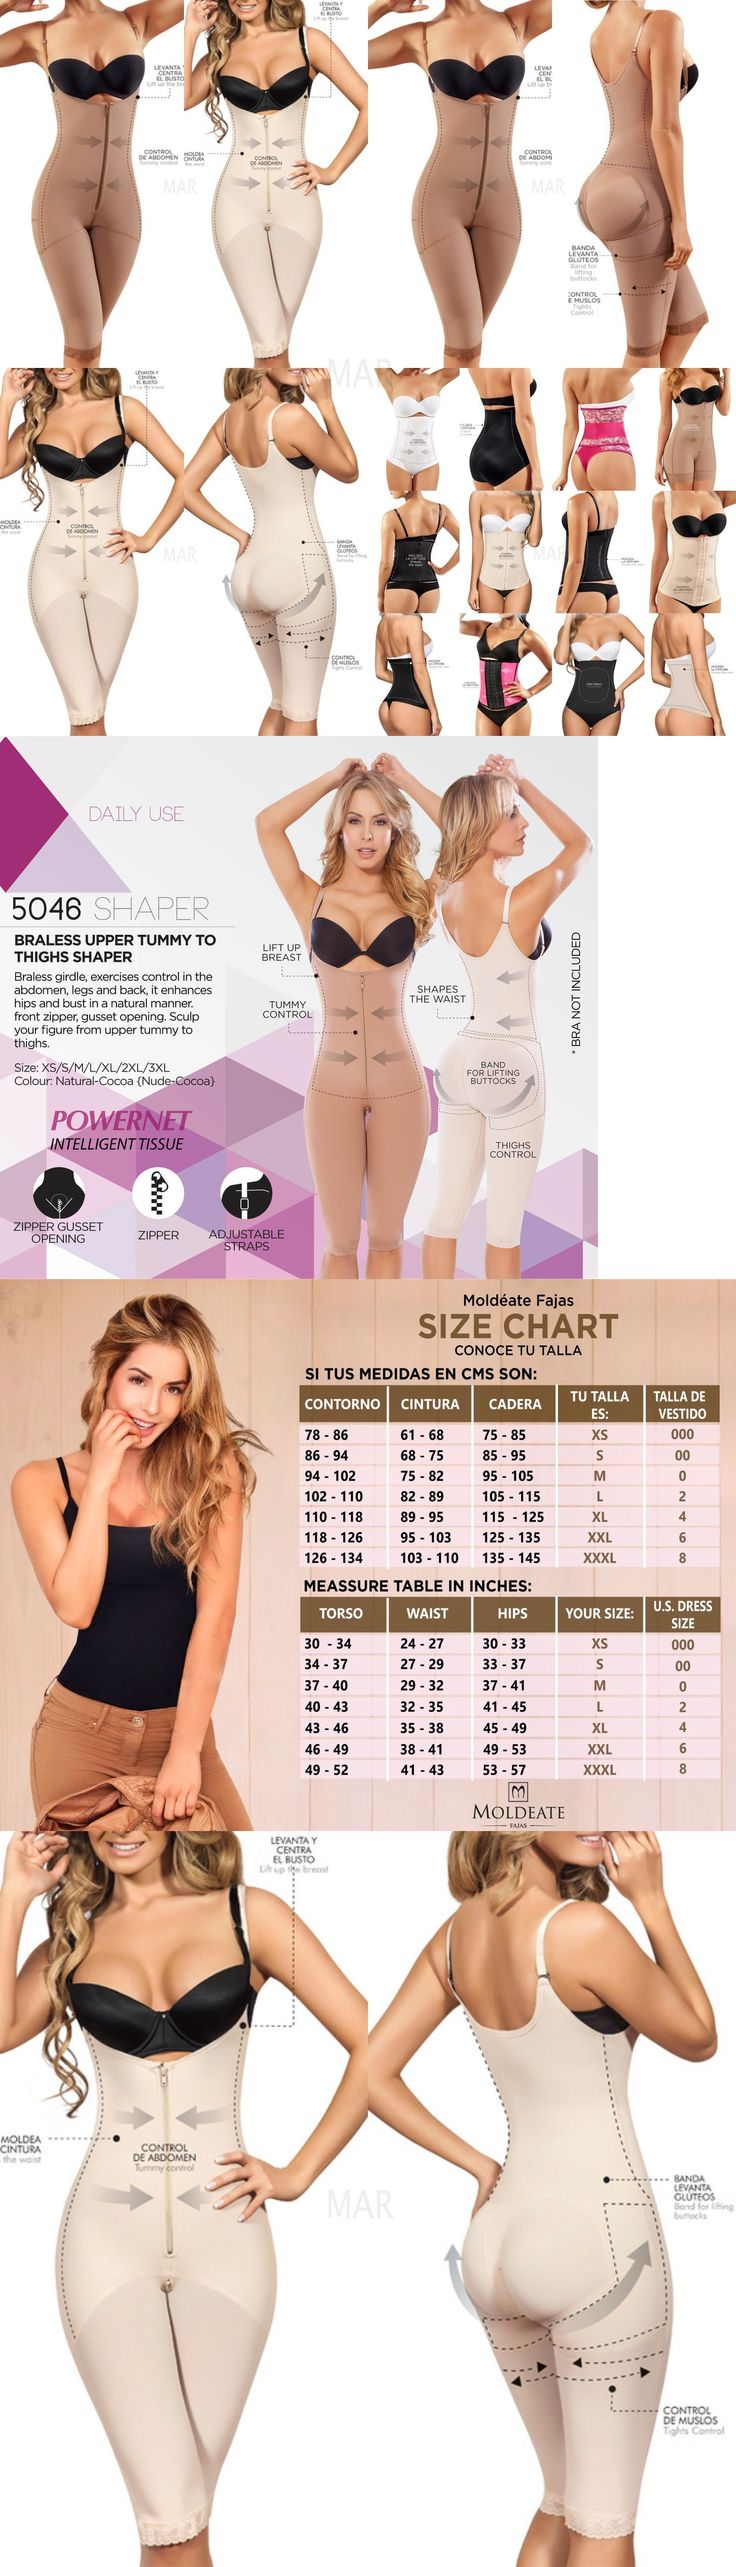 Women Shapewear: Body Shaper Moldeate Mid Tight, Butt Lifter, Post-Surgery, Post-Partum Girdle -> BUY IT NOW ONLY: $77 on eBay!